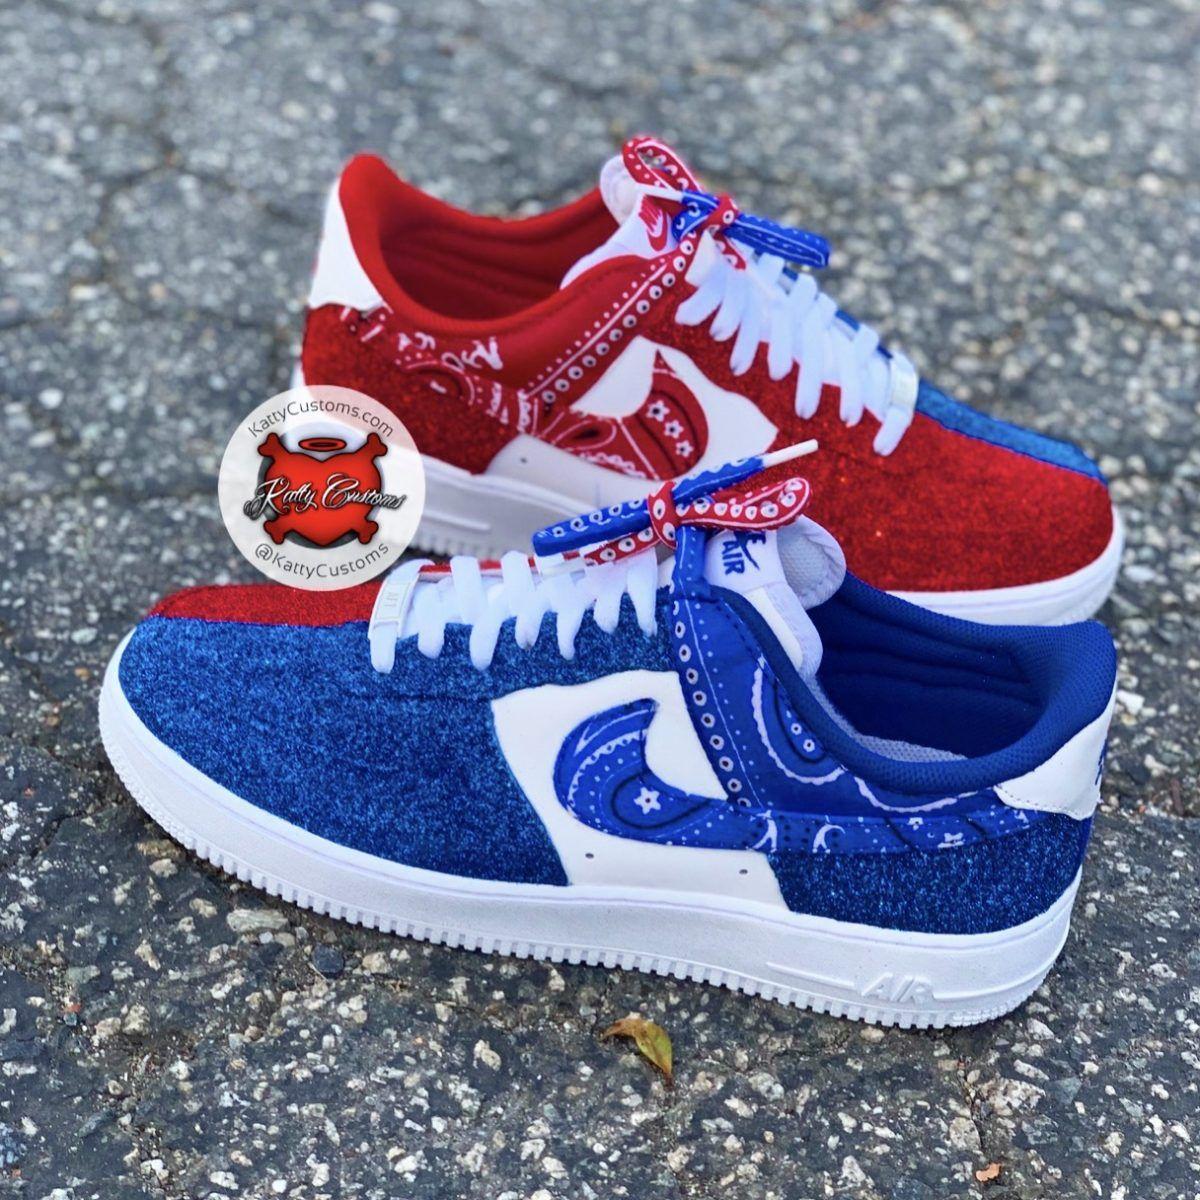 Products Katty Customs Red bandana shoes, Nike shoes